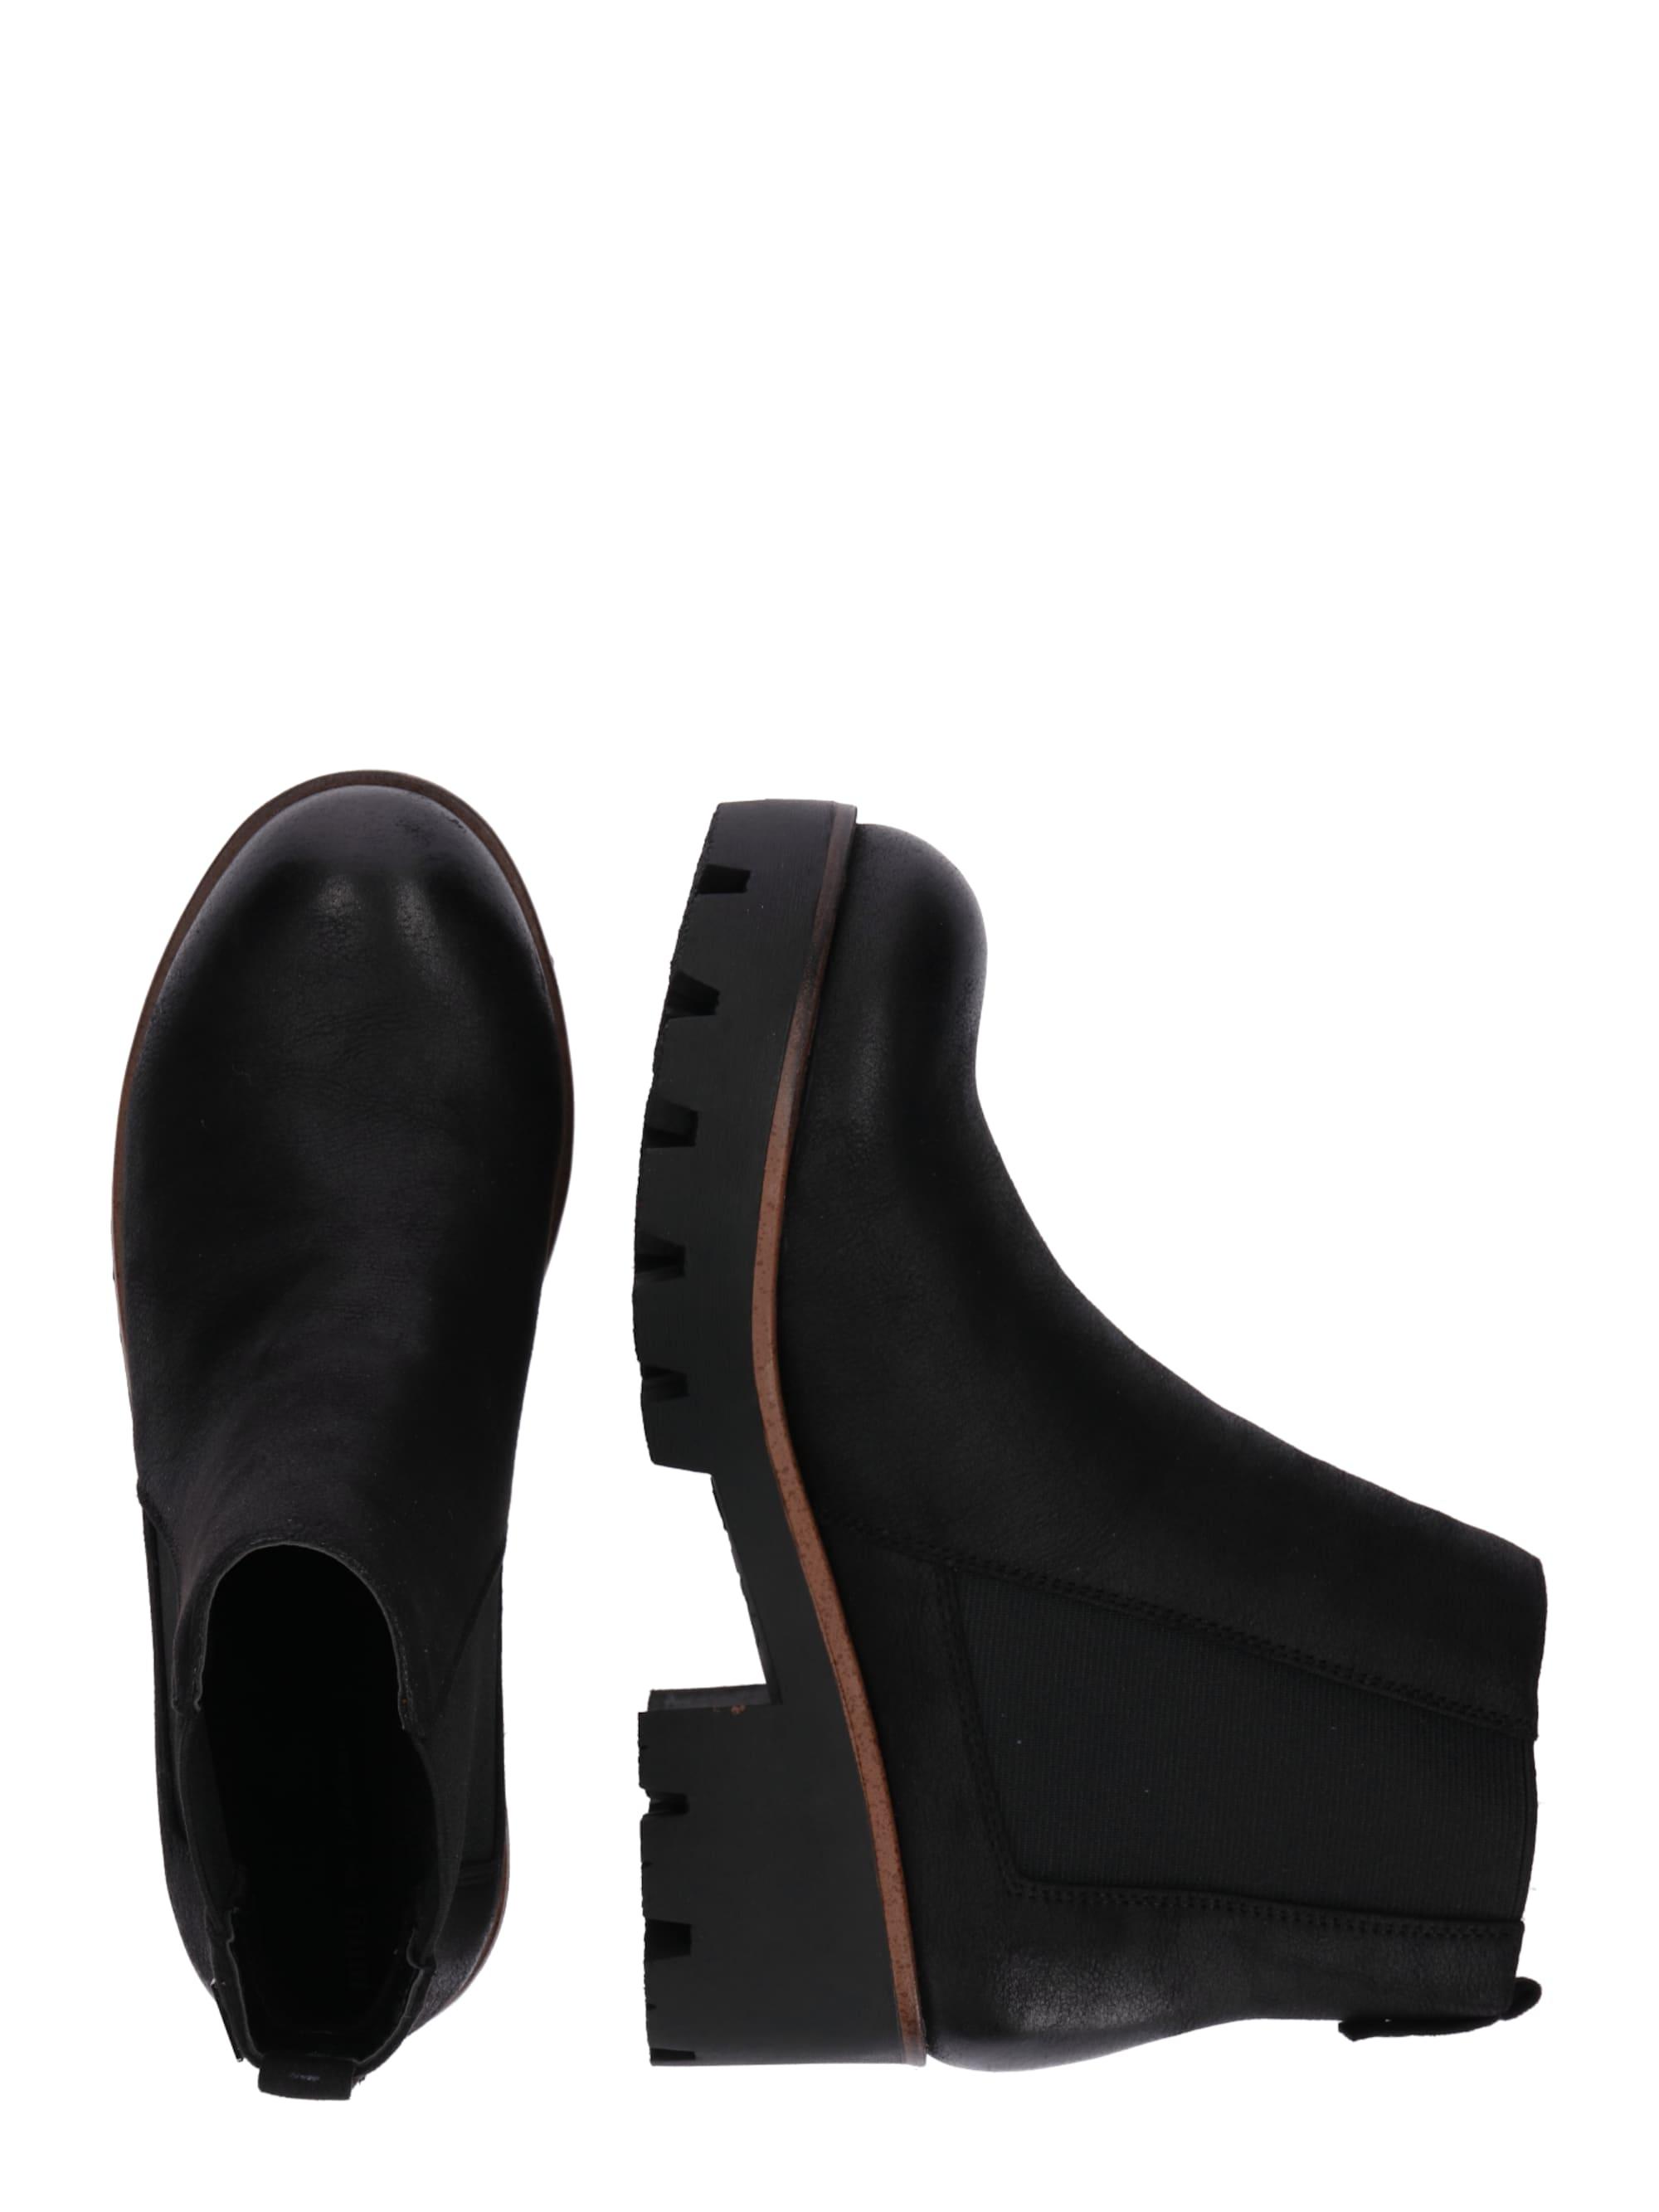 Chelsea boots 'Sauro'